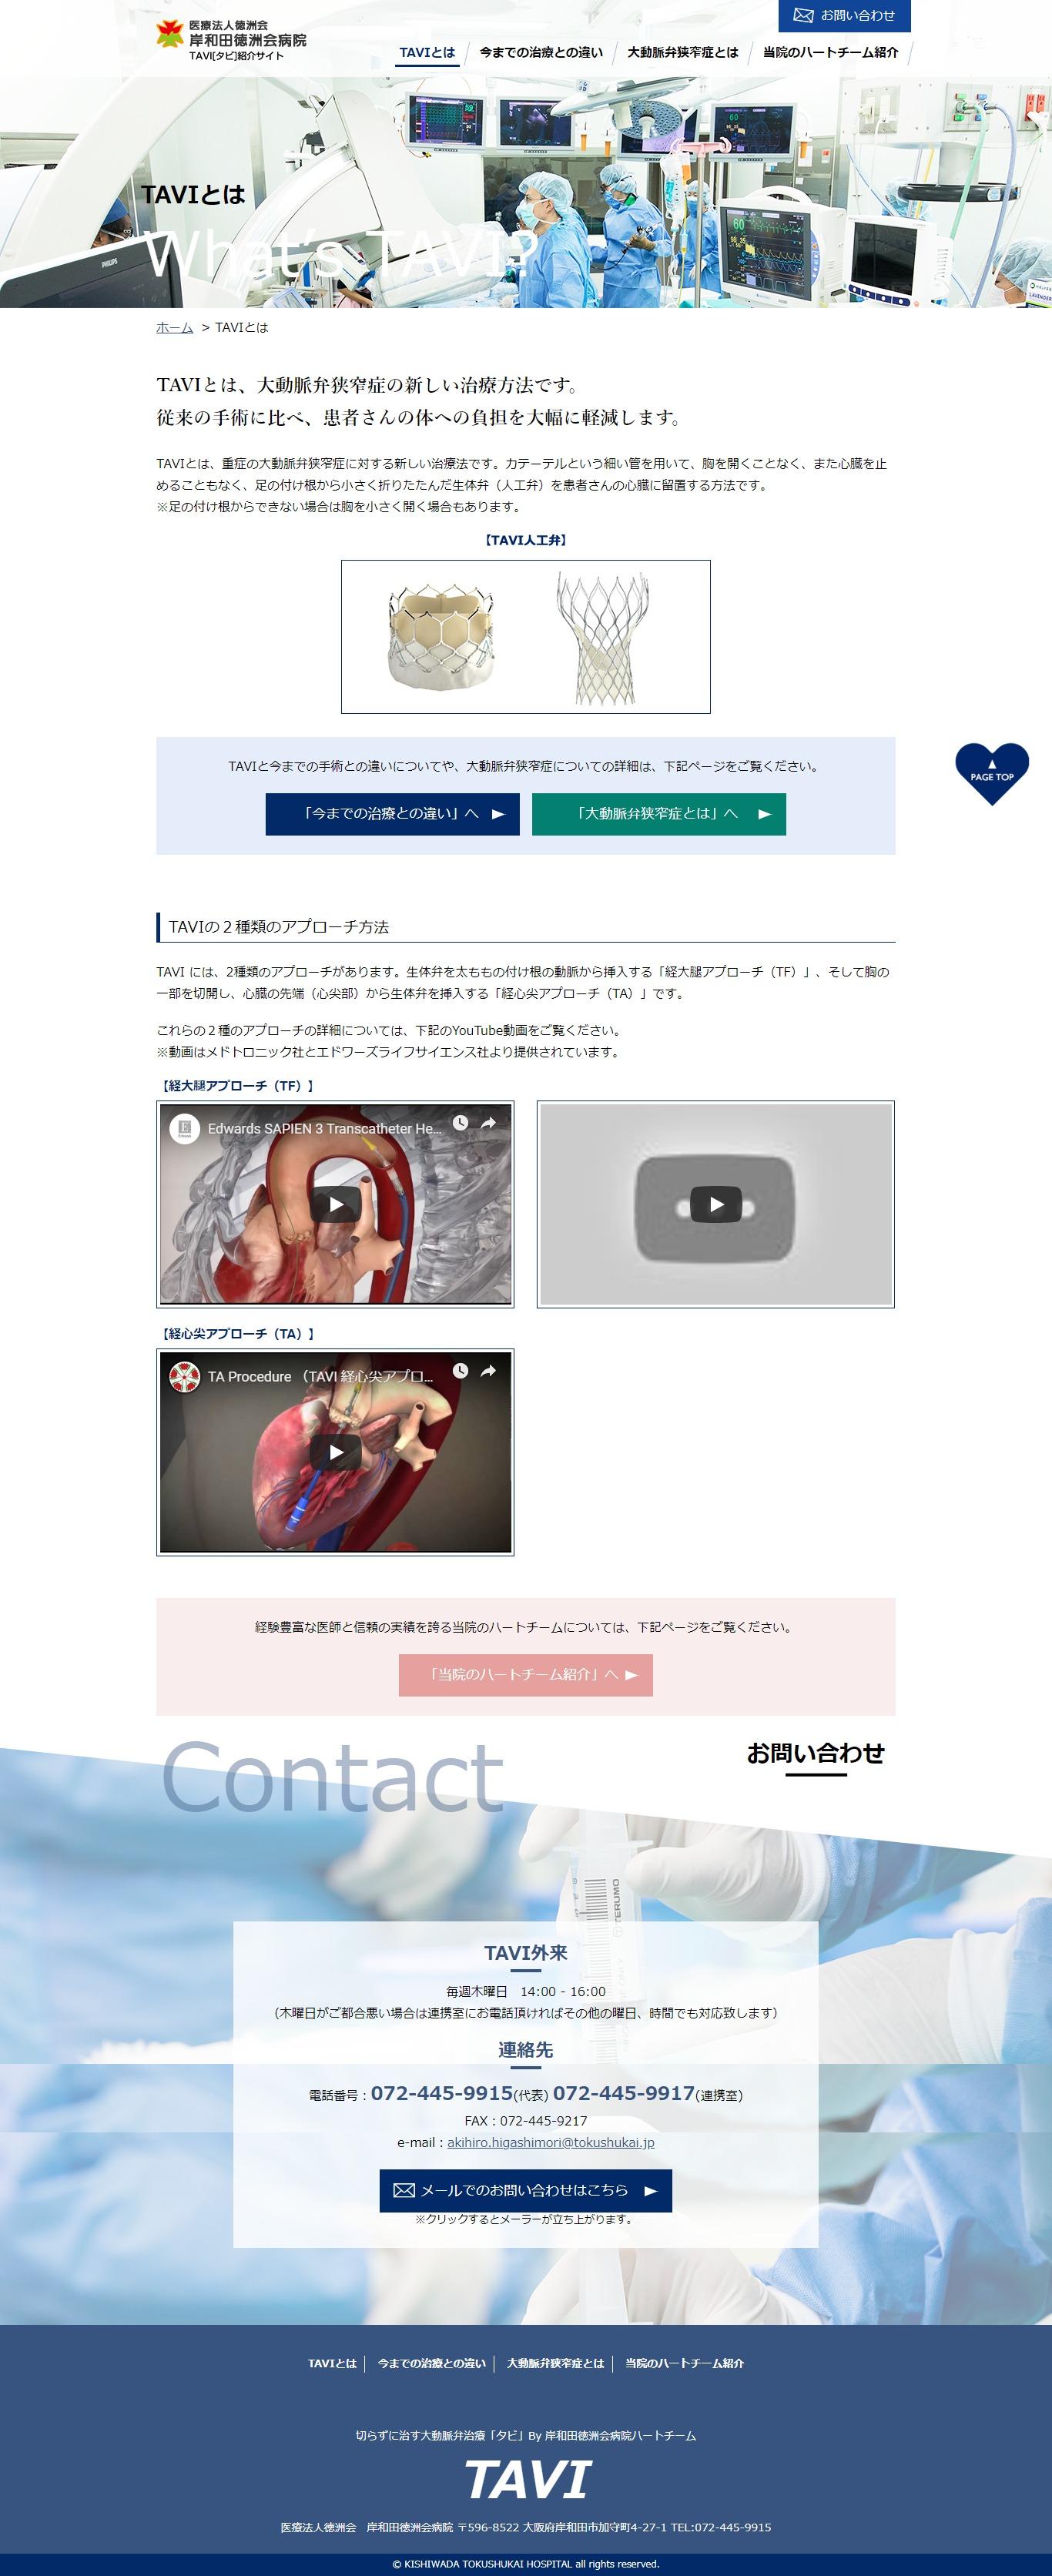 2018年4月作成「岸和田徳洲会病院」TAVI紹介サイト_サブ画像